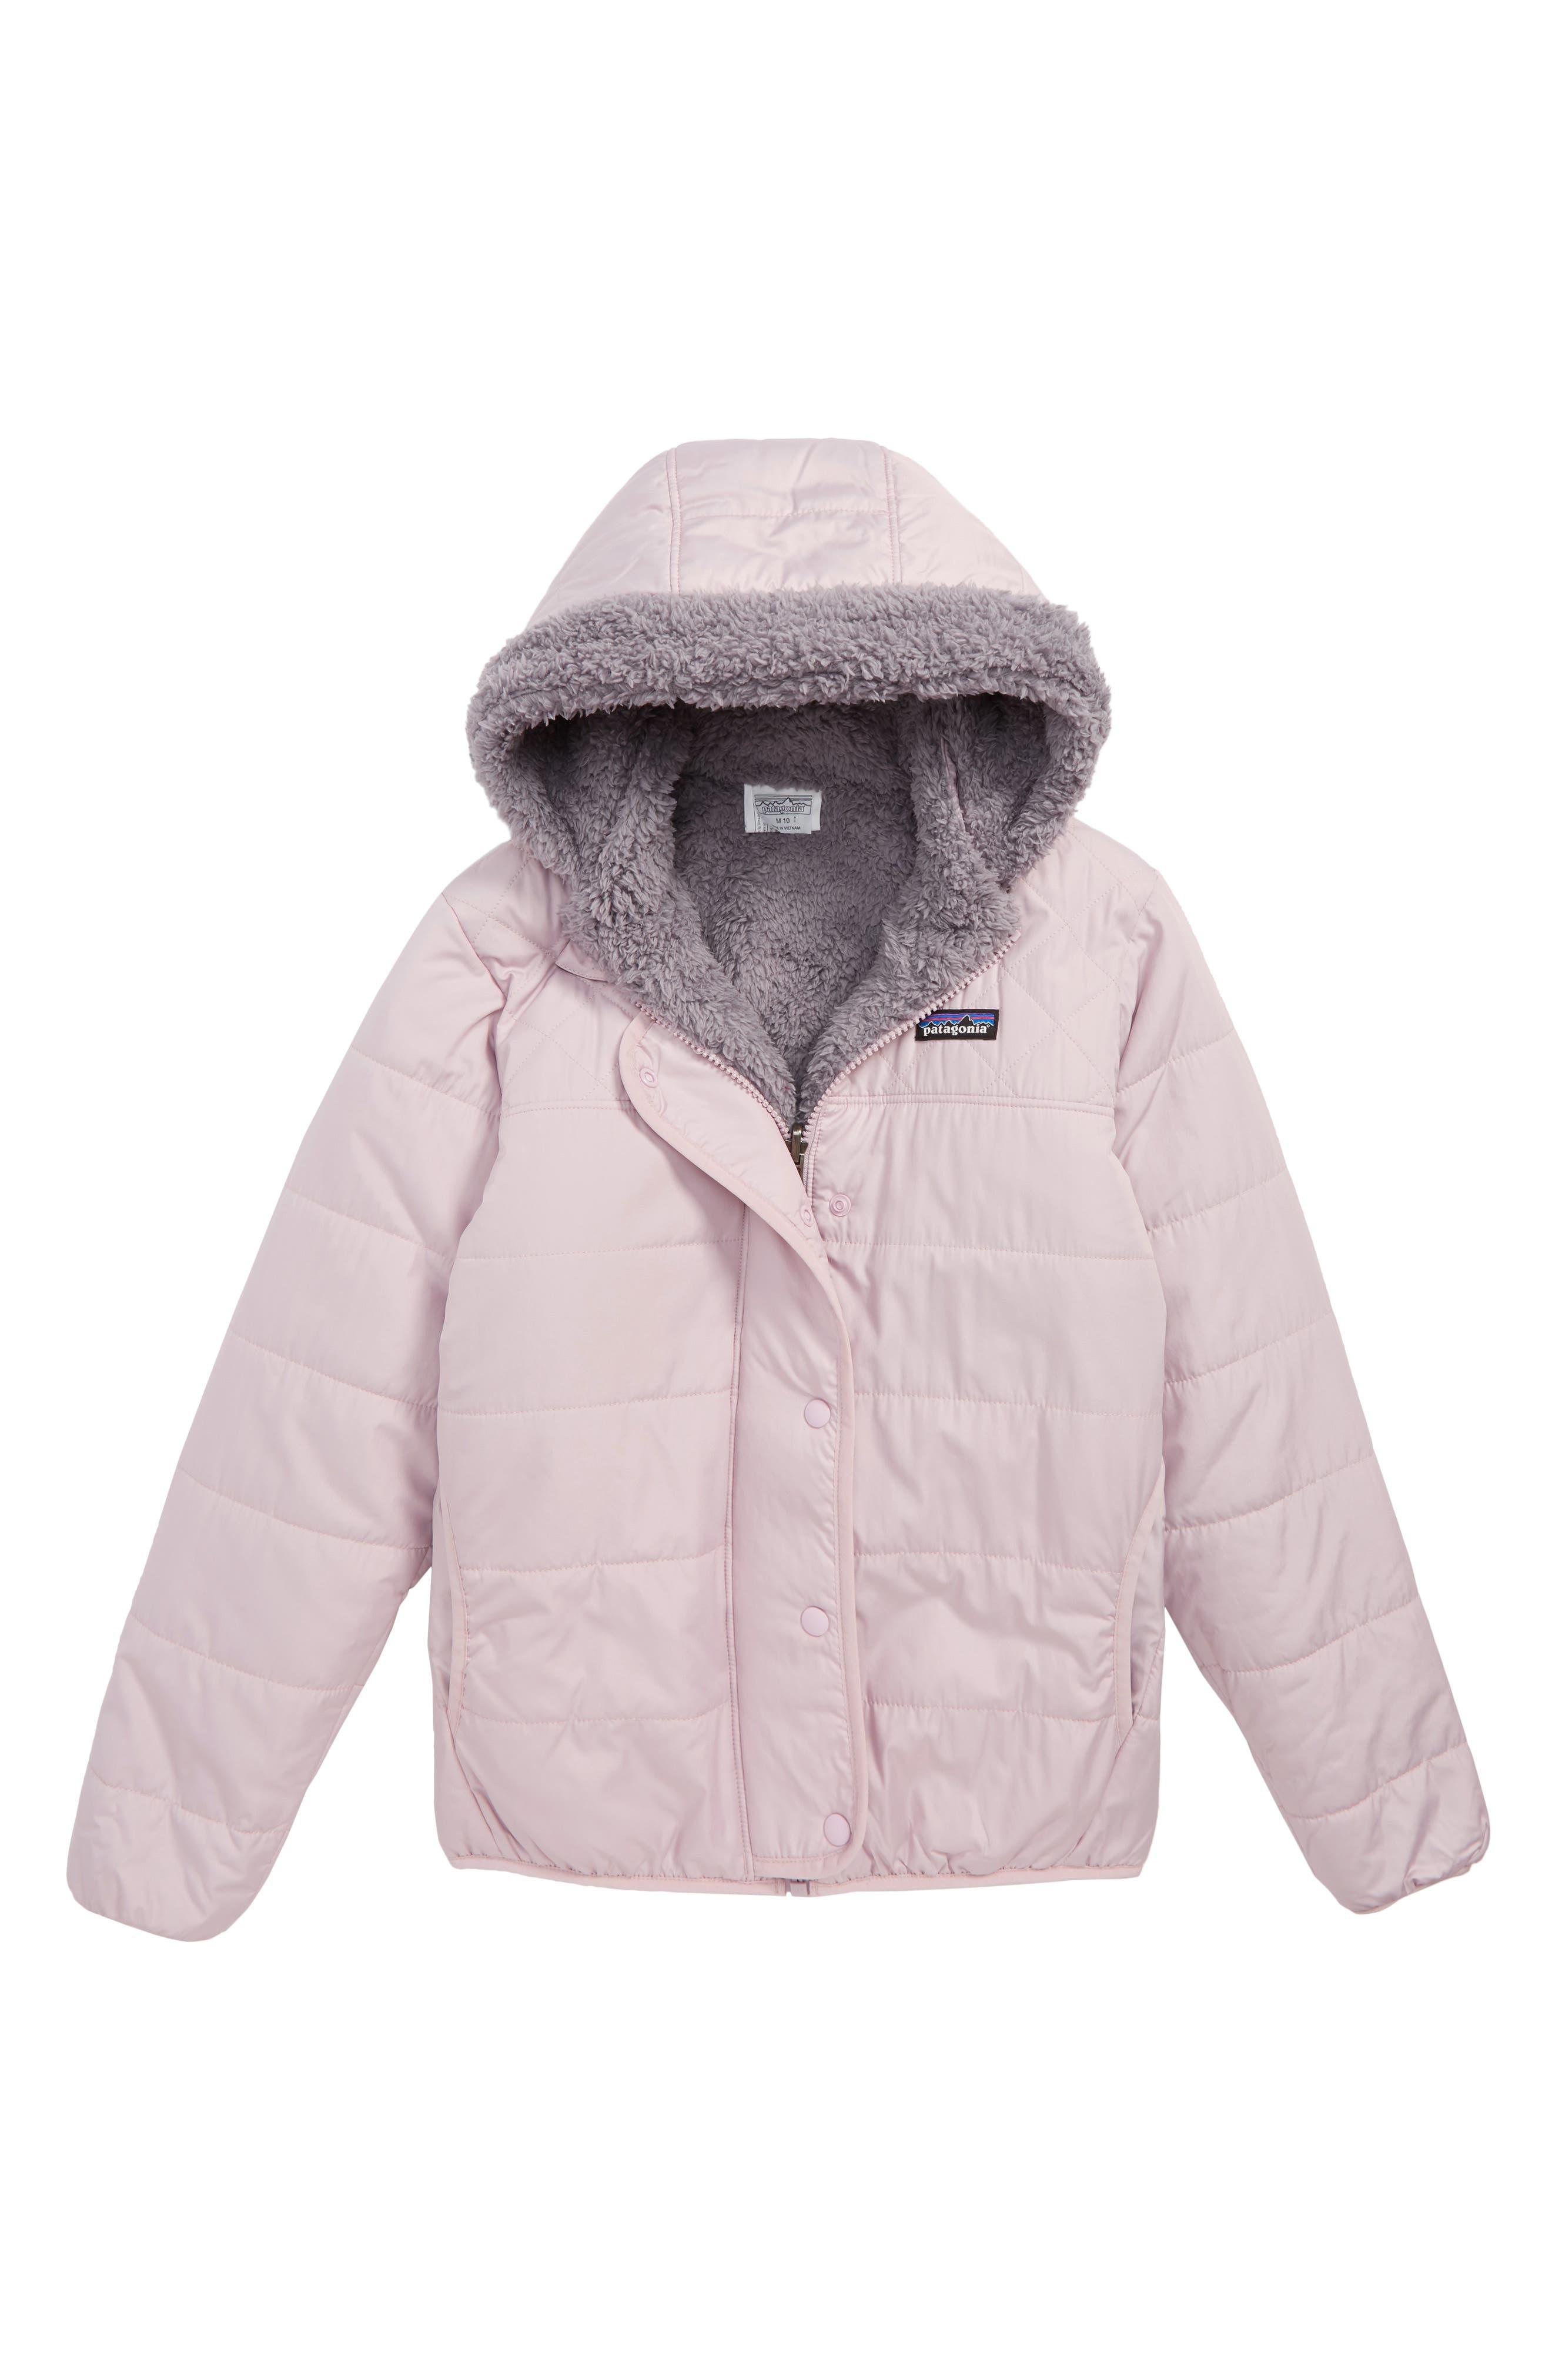 Dream Song Water Repellent Reversible Jacket,                         Main,                         color, GLAZE PURPLE